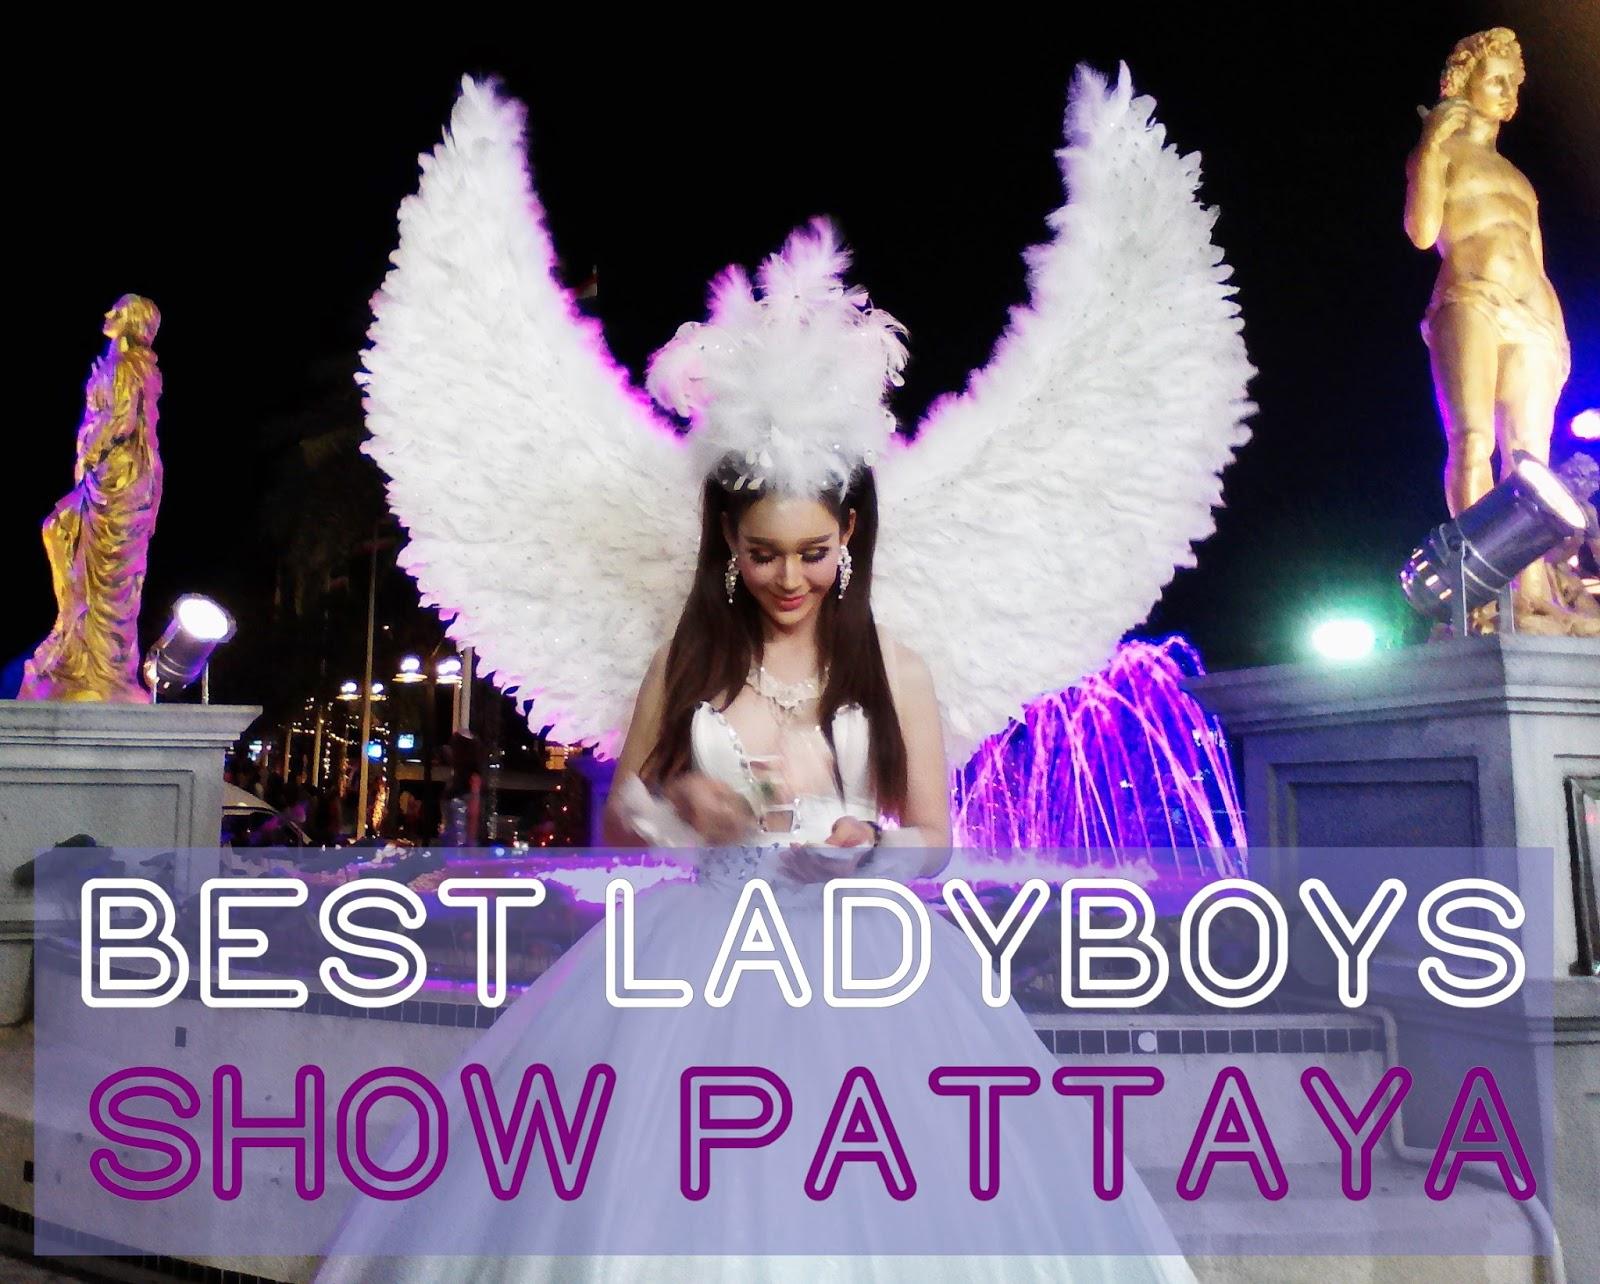 Ladyboy Box